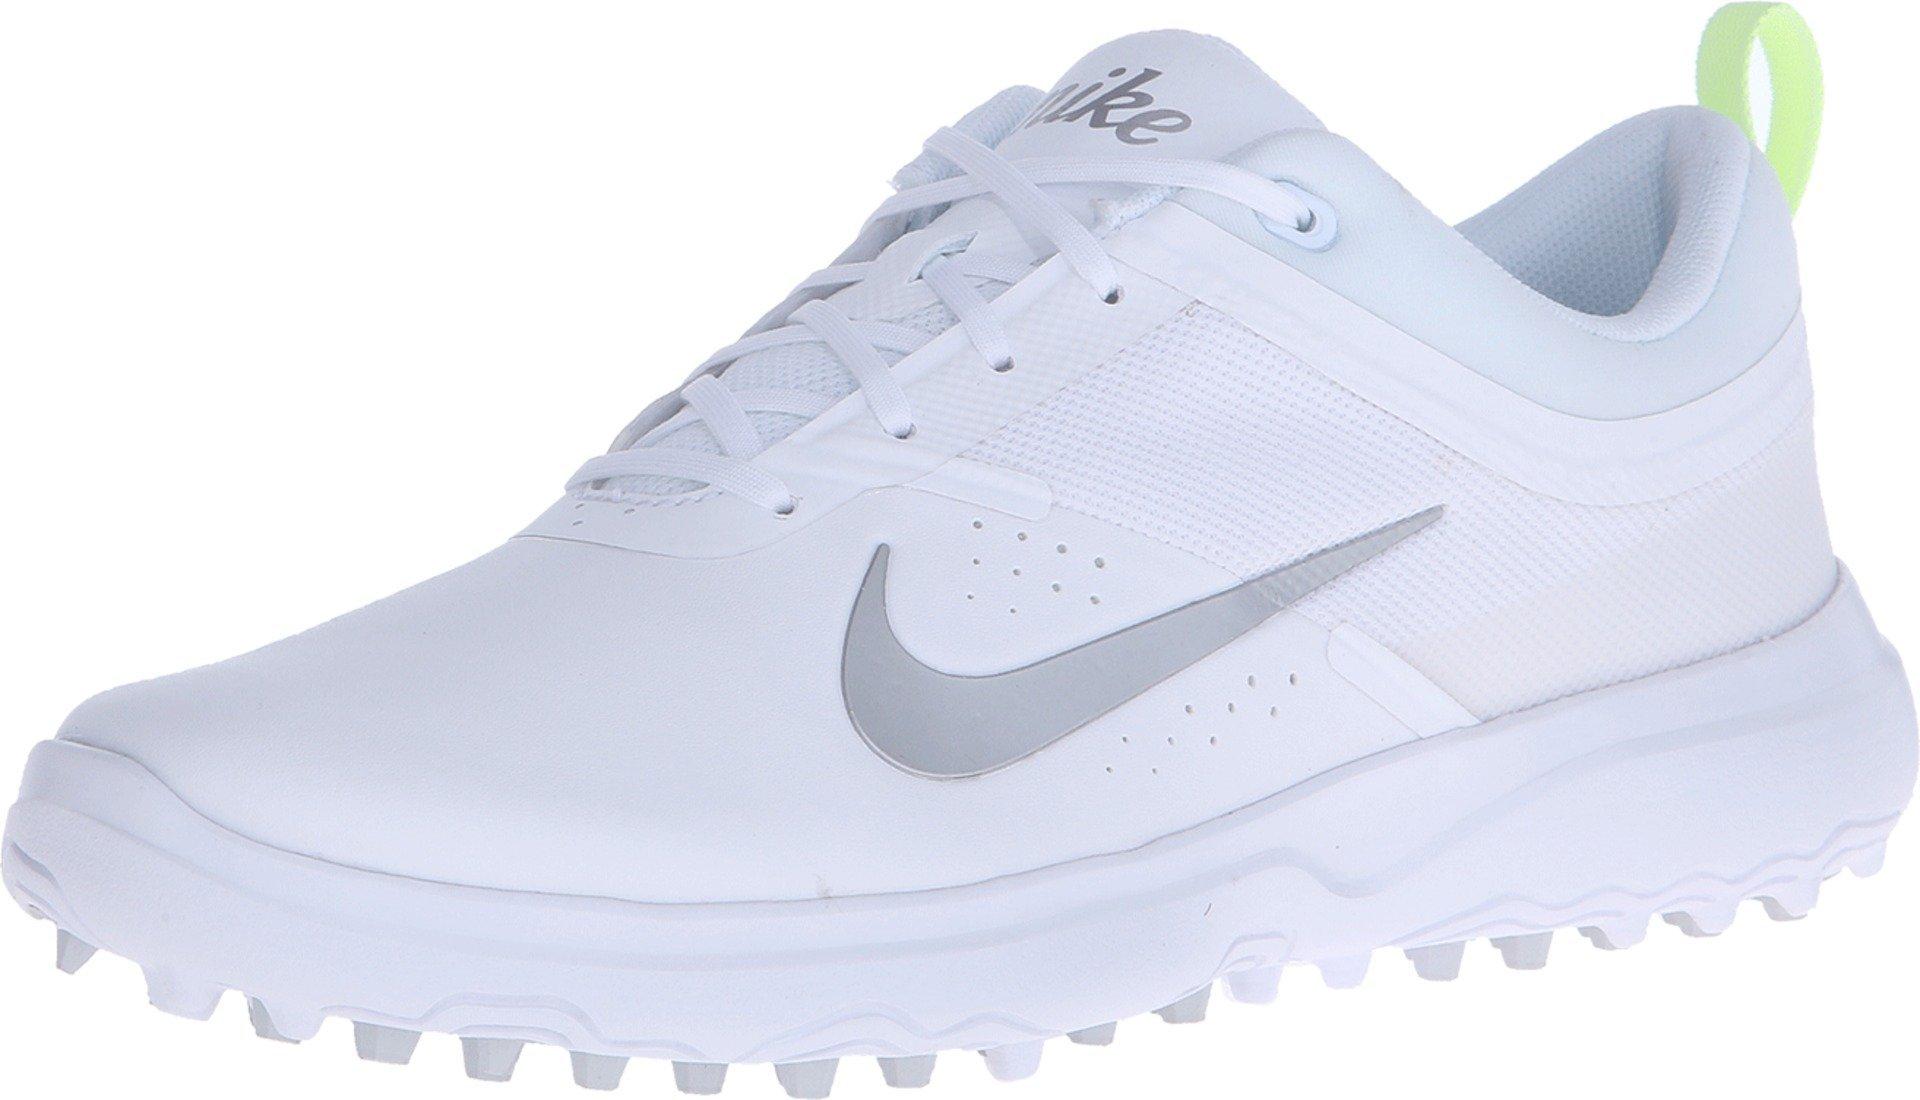 Nike AKAMAI Spikeless Golf Shoes 2017 Women White/Pure Platinum/Metallic Silver Medium 6.5